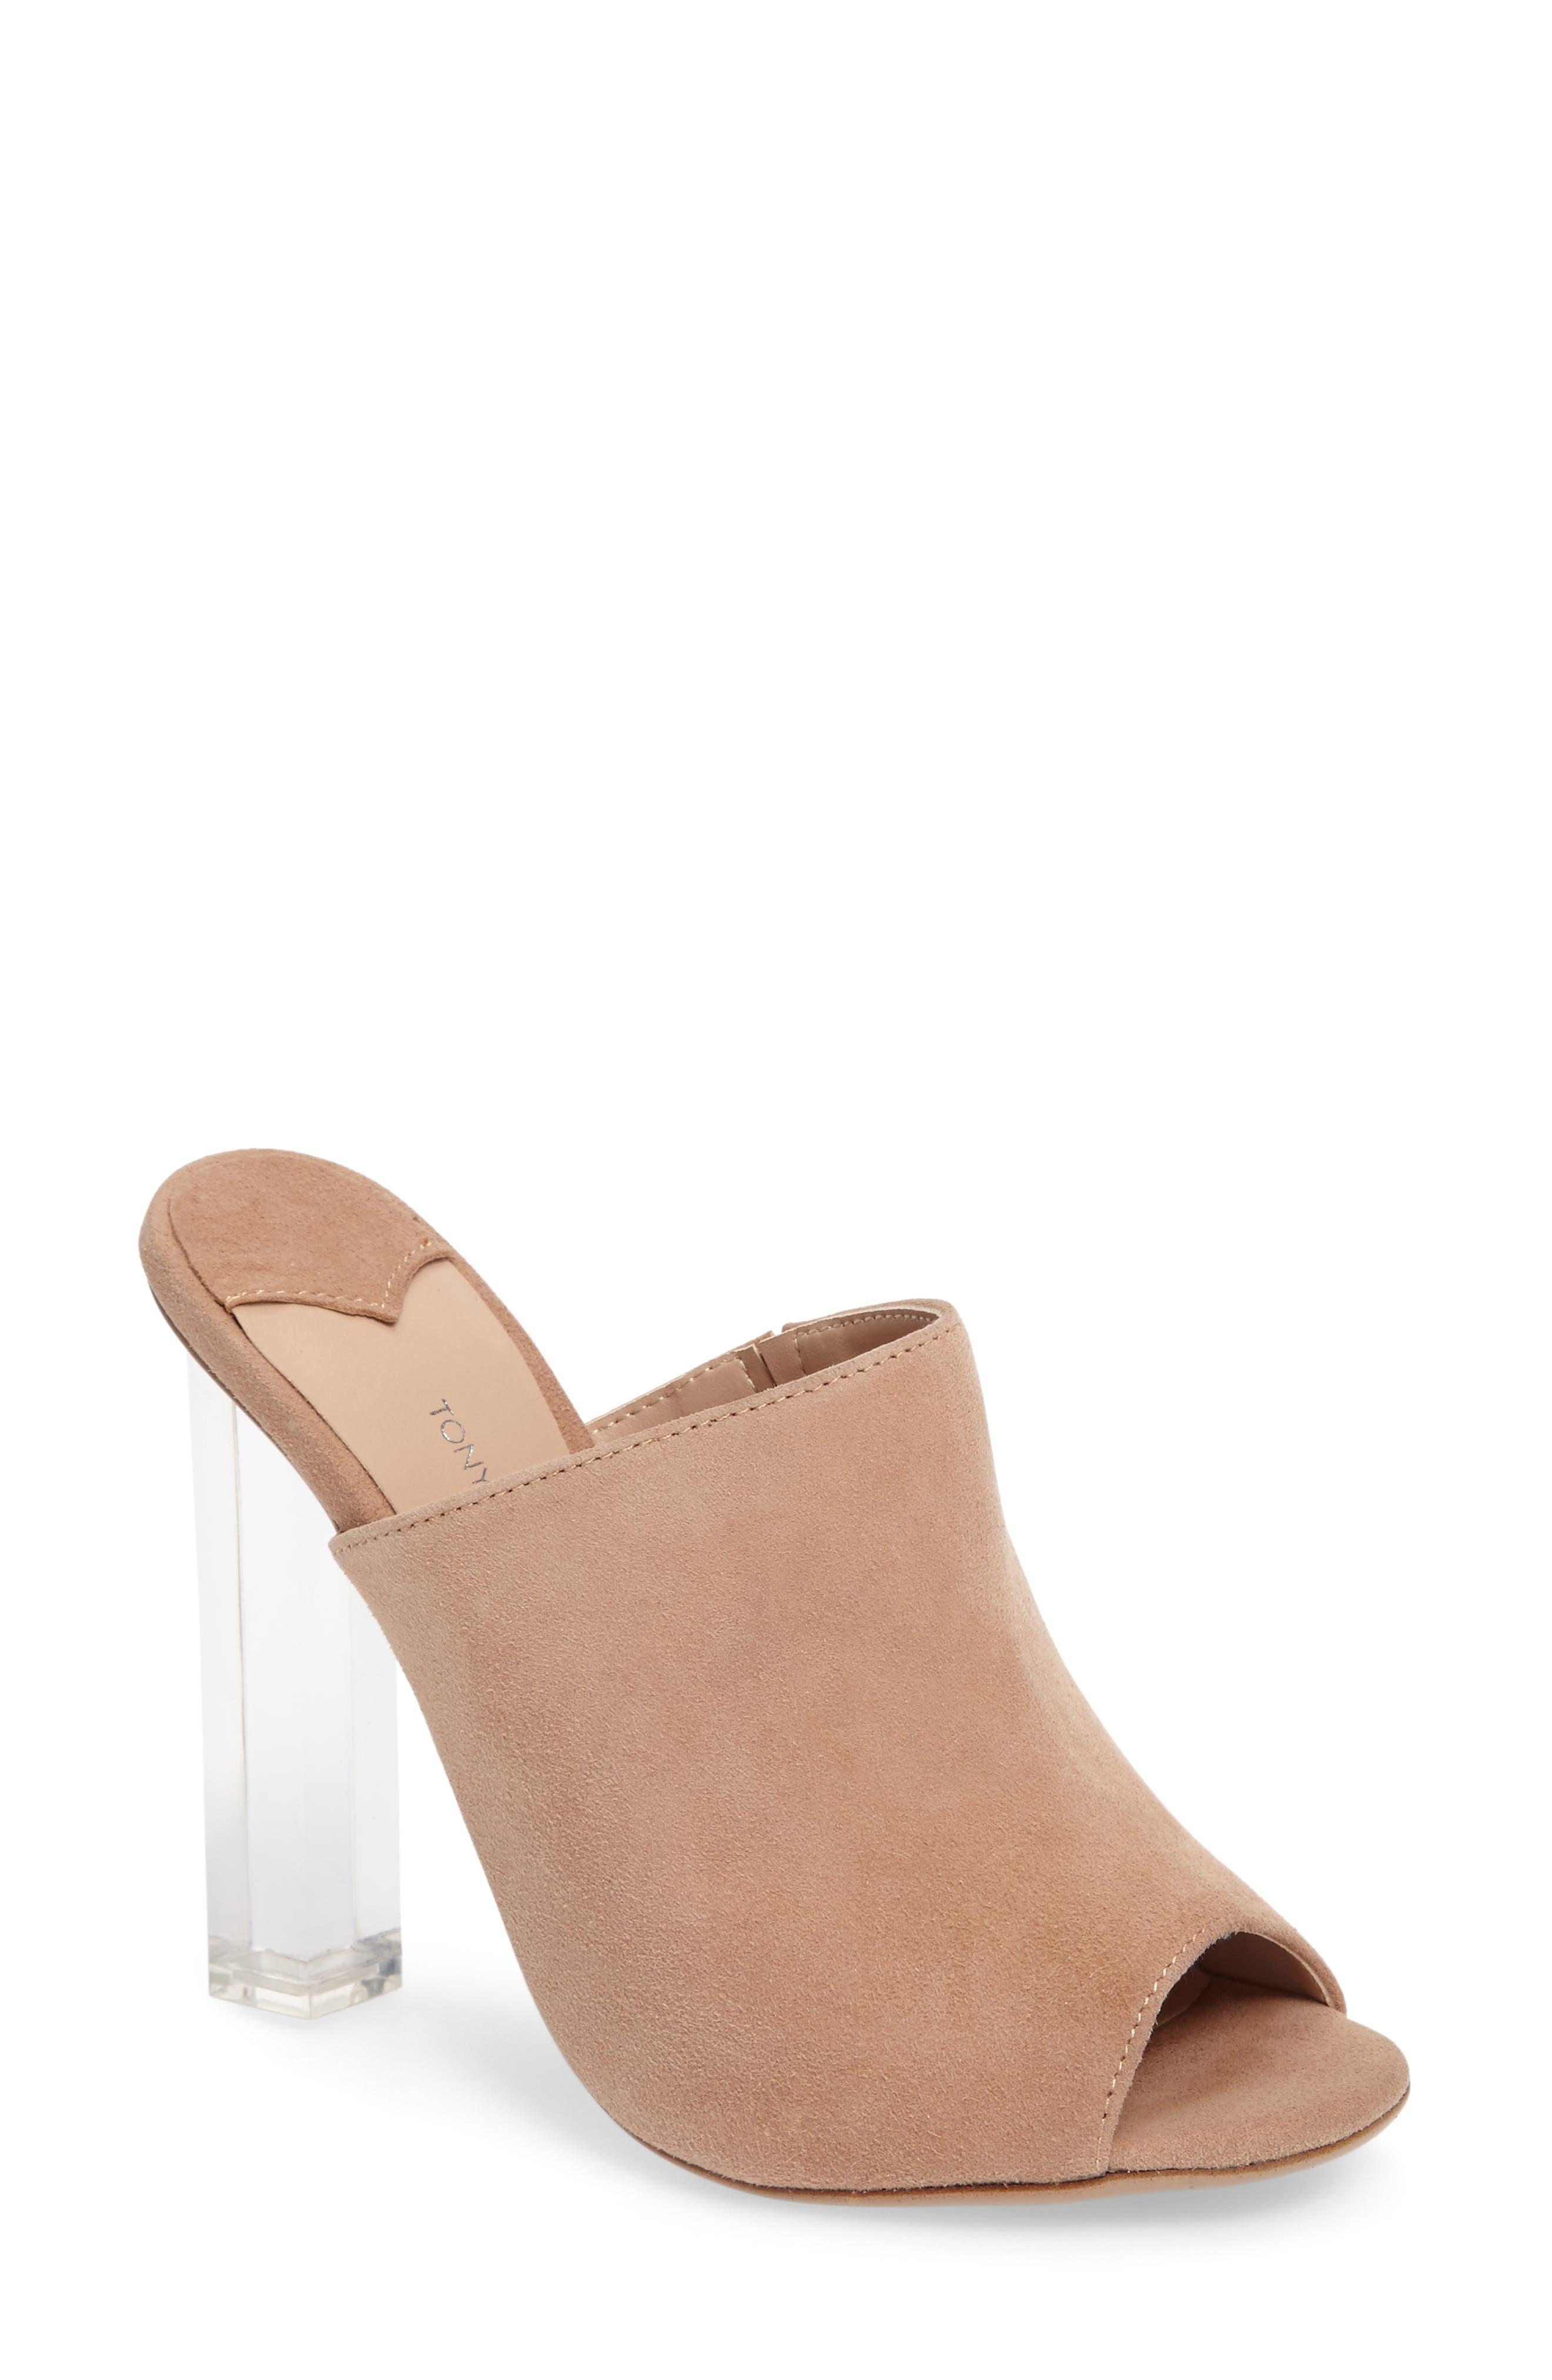 Alternate Image 1 Selected - Tony Bianco Kitzy Clear Heel Mule (Women)